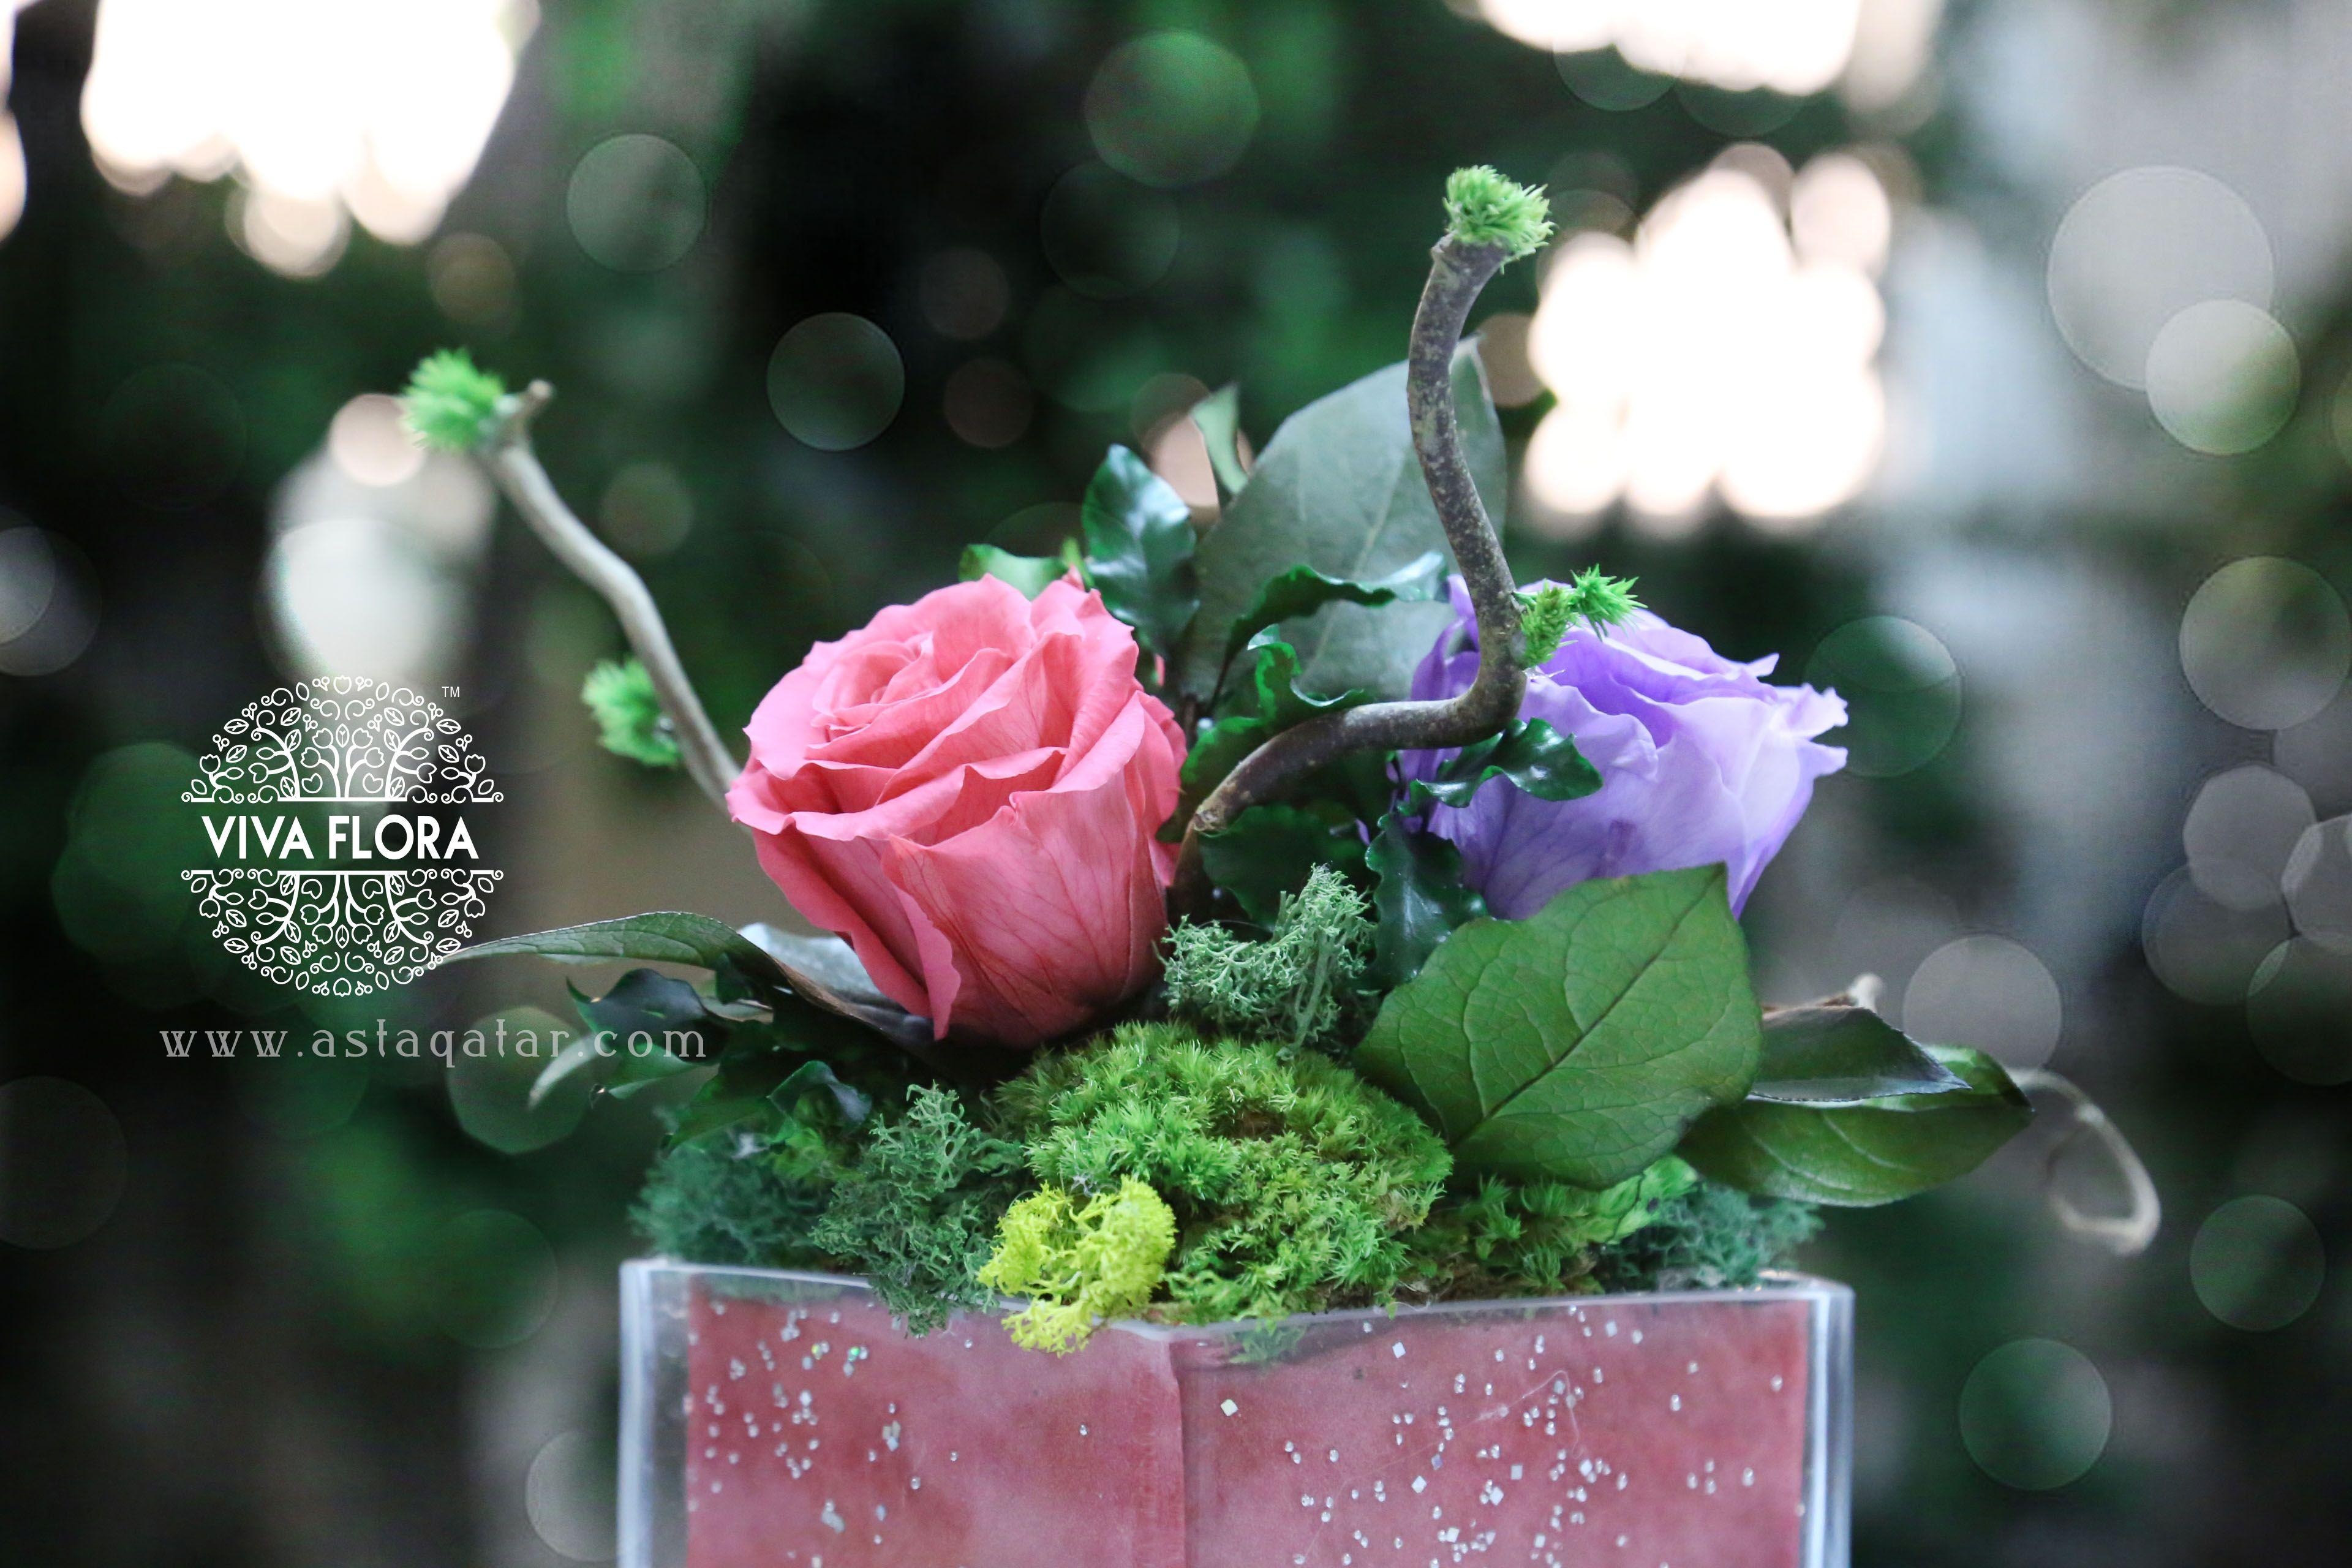 Viva Flora Occasional Preserved Flower Arrangements - Doha , Qatar